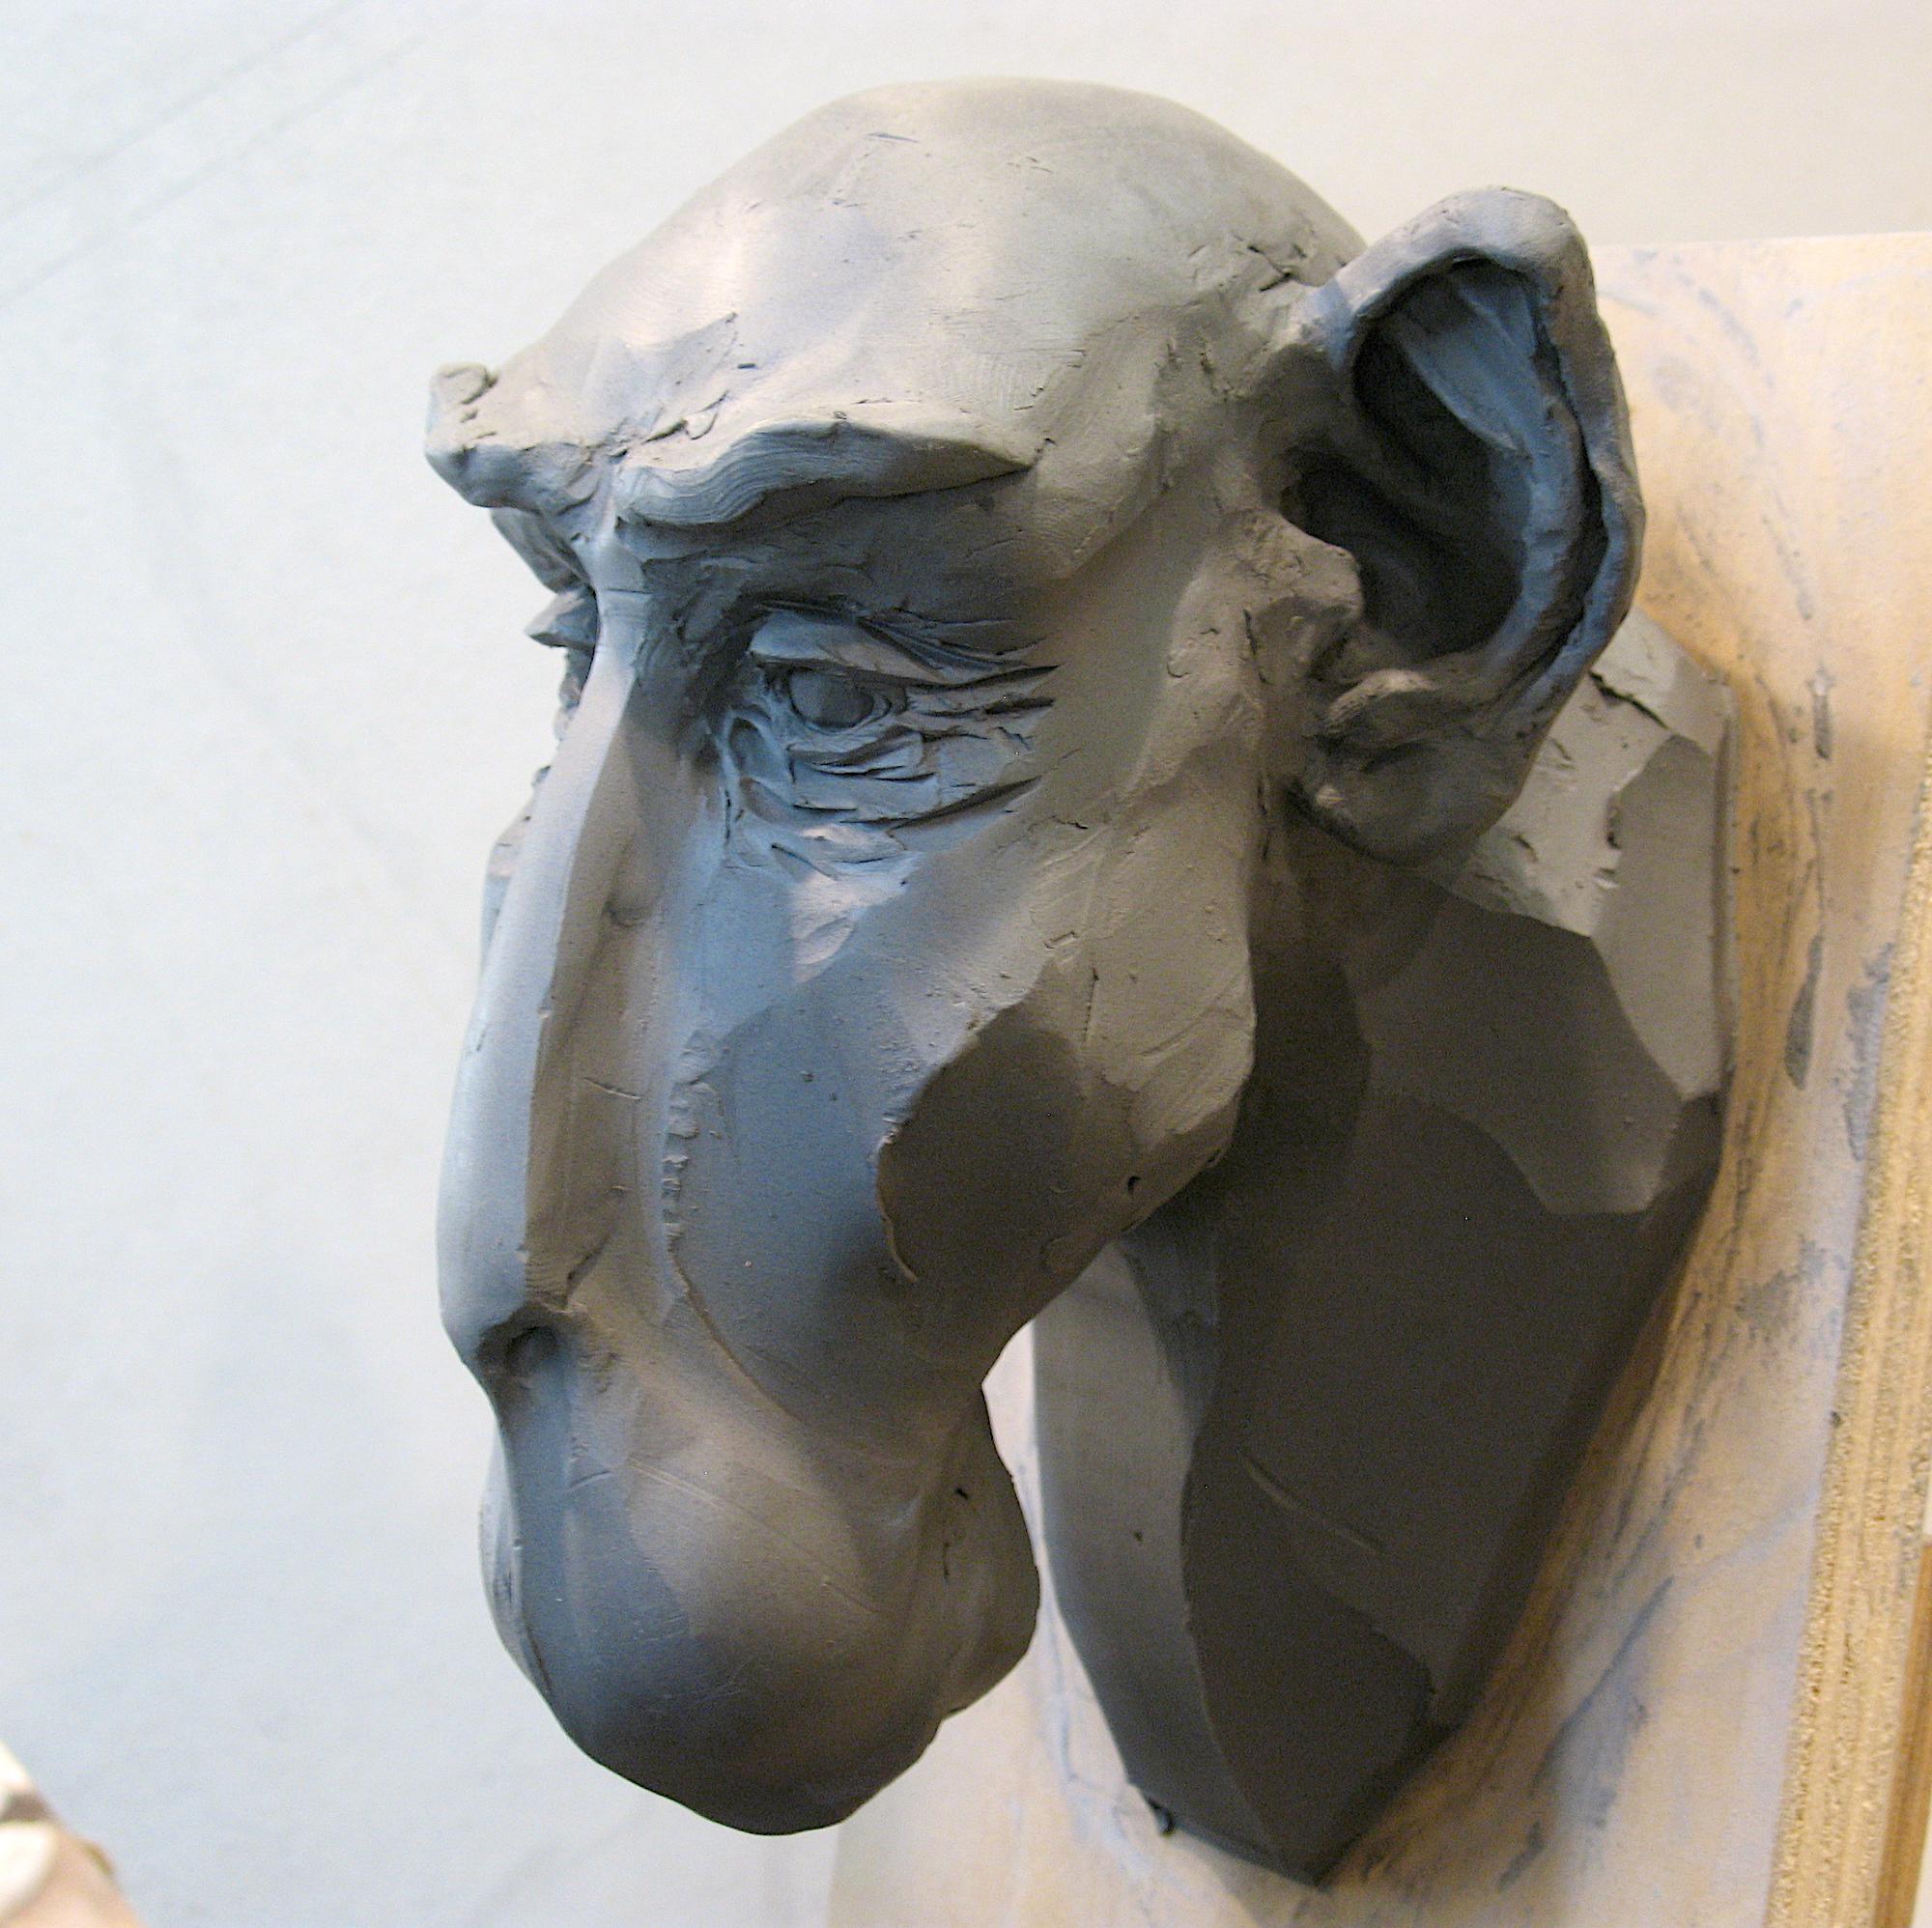 Steve Eichenberger sculpture WIP2